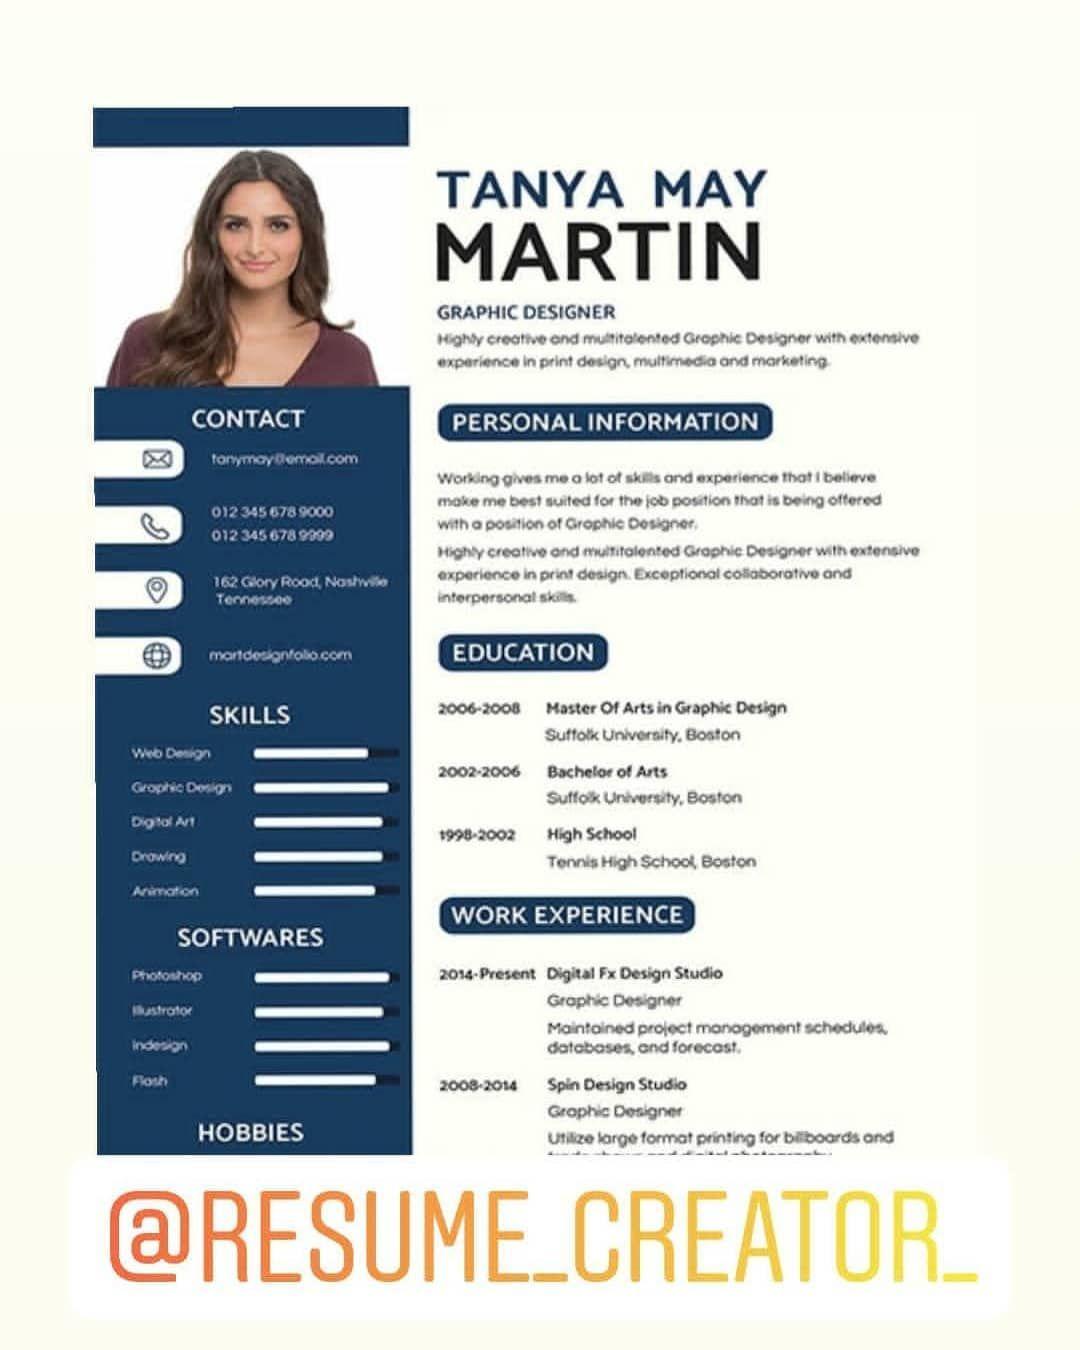 Resume preparations statistics proofreading site